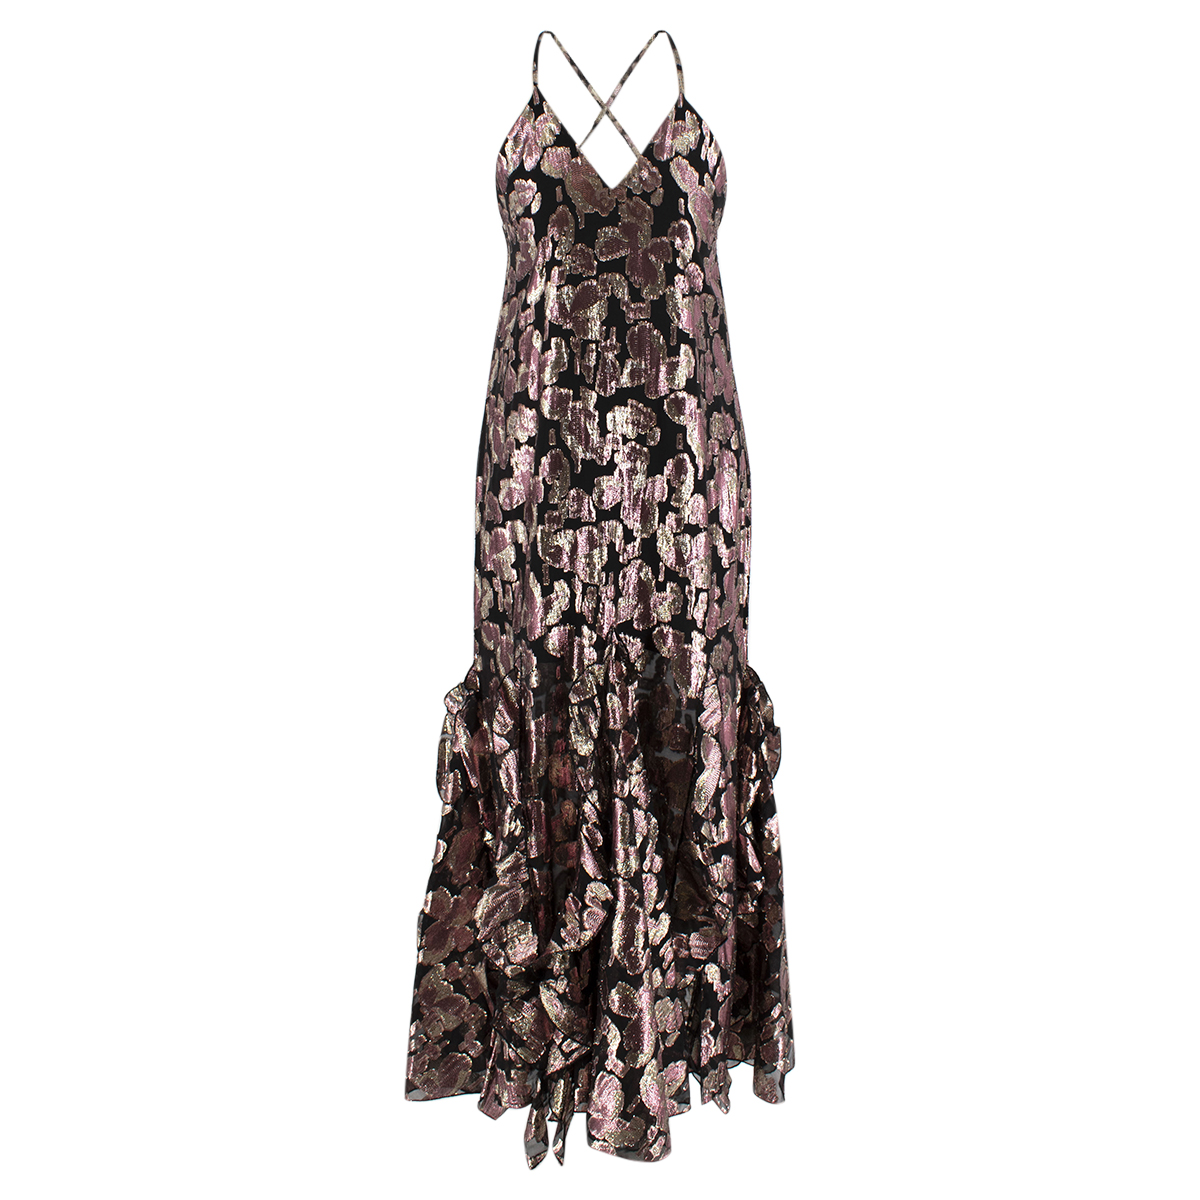 Alice McCall Best of You Metallic Dress